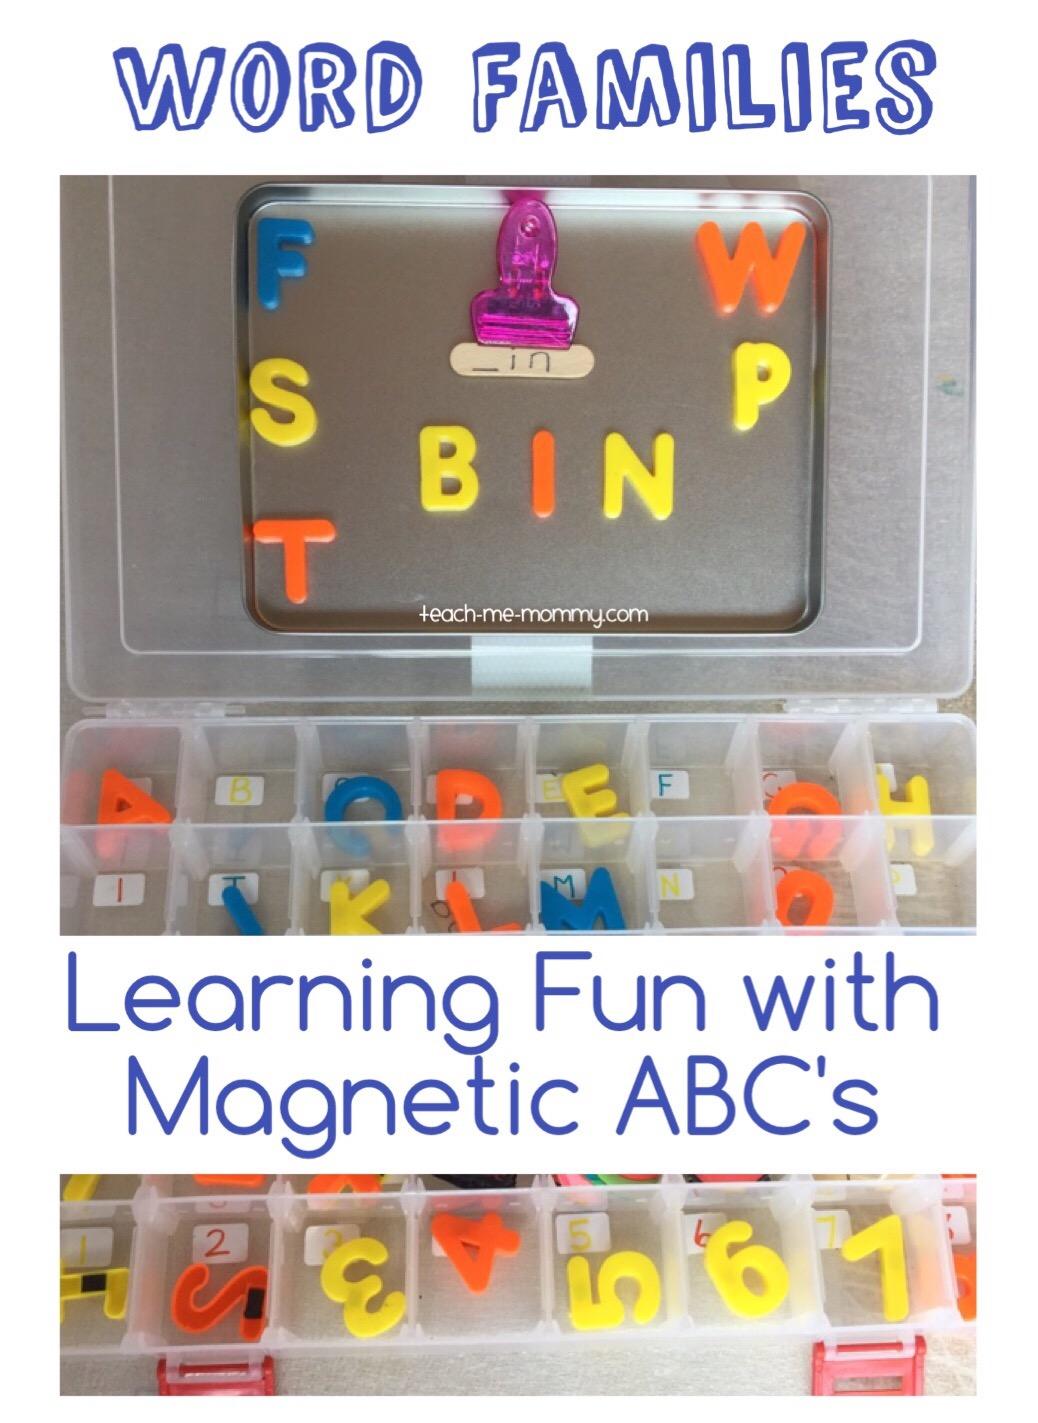 magnetic abc learning fun